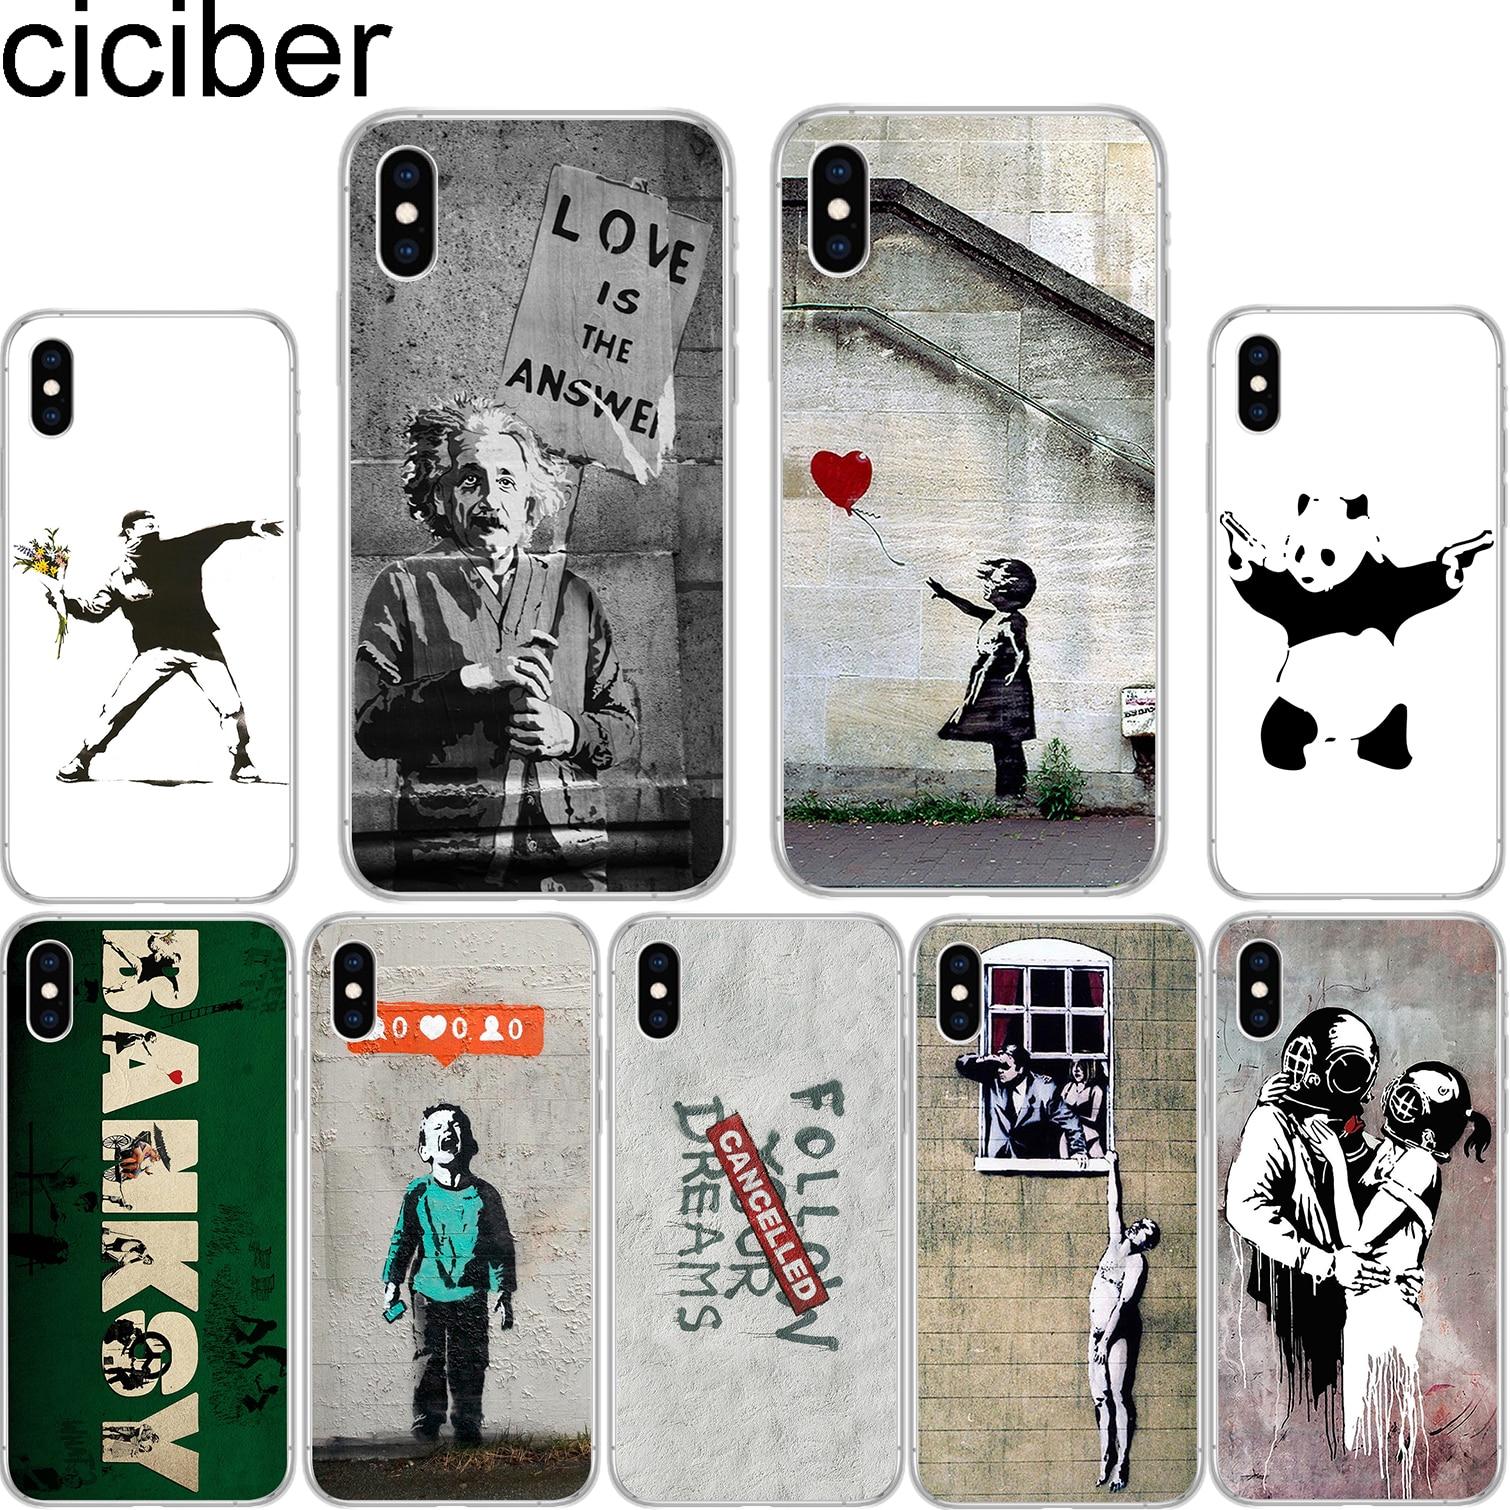 Ciciber banksy albert Palestina arte de la calle suave cubierta TPU para iPhone 11 Pro Max 6S 6 7 8 plus 5S SE X XS X Max XR Coque Funda